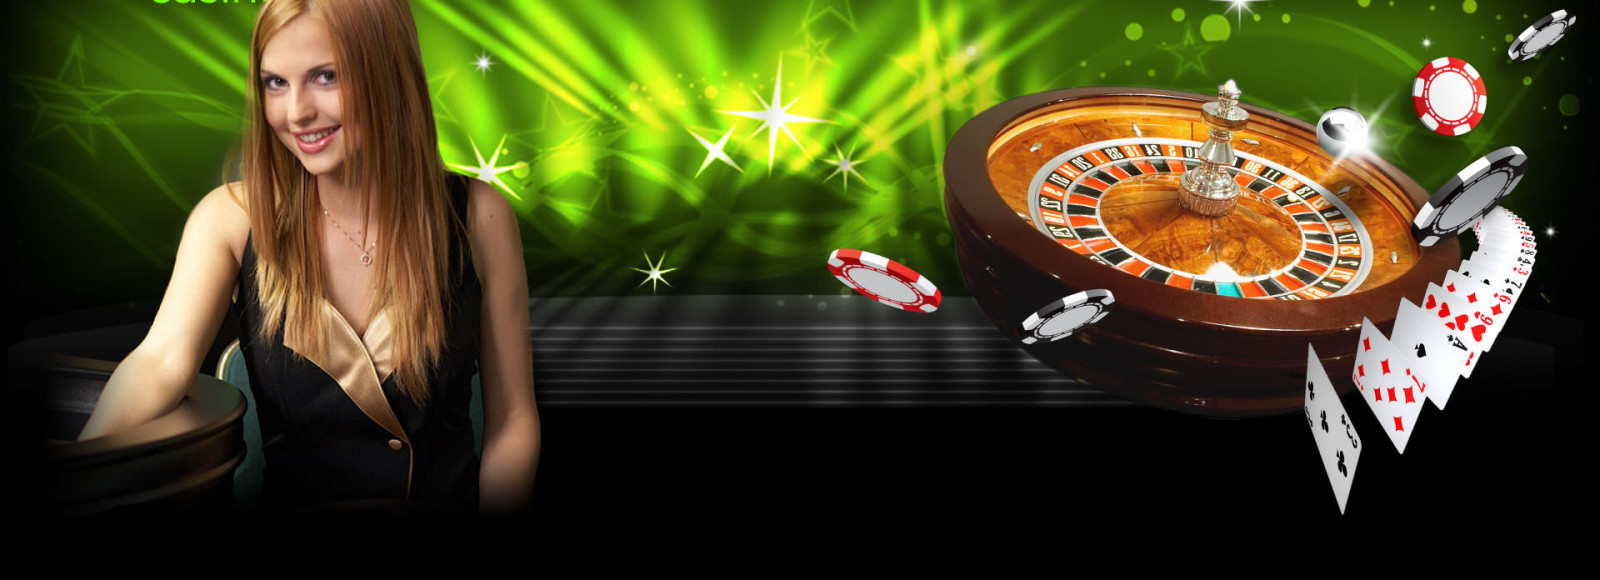 Us mobile casino no deposit